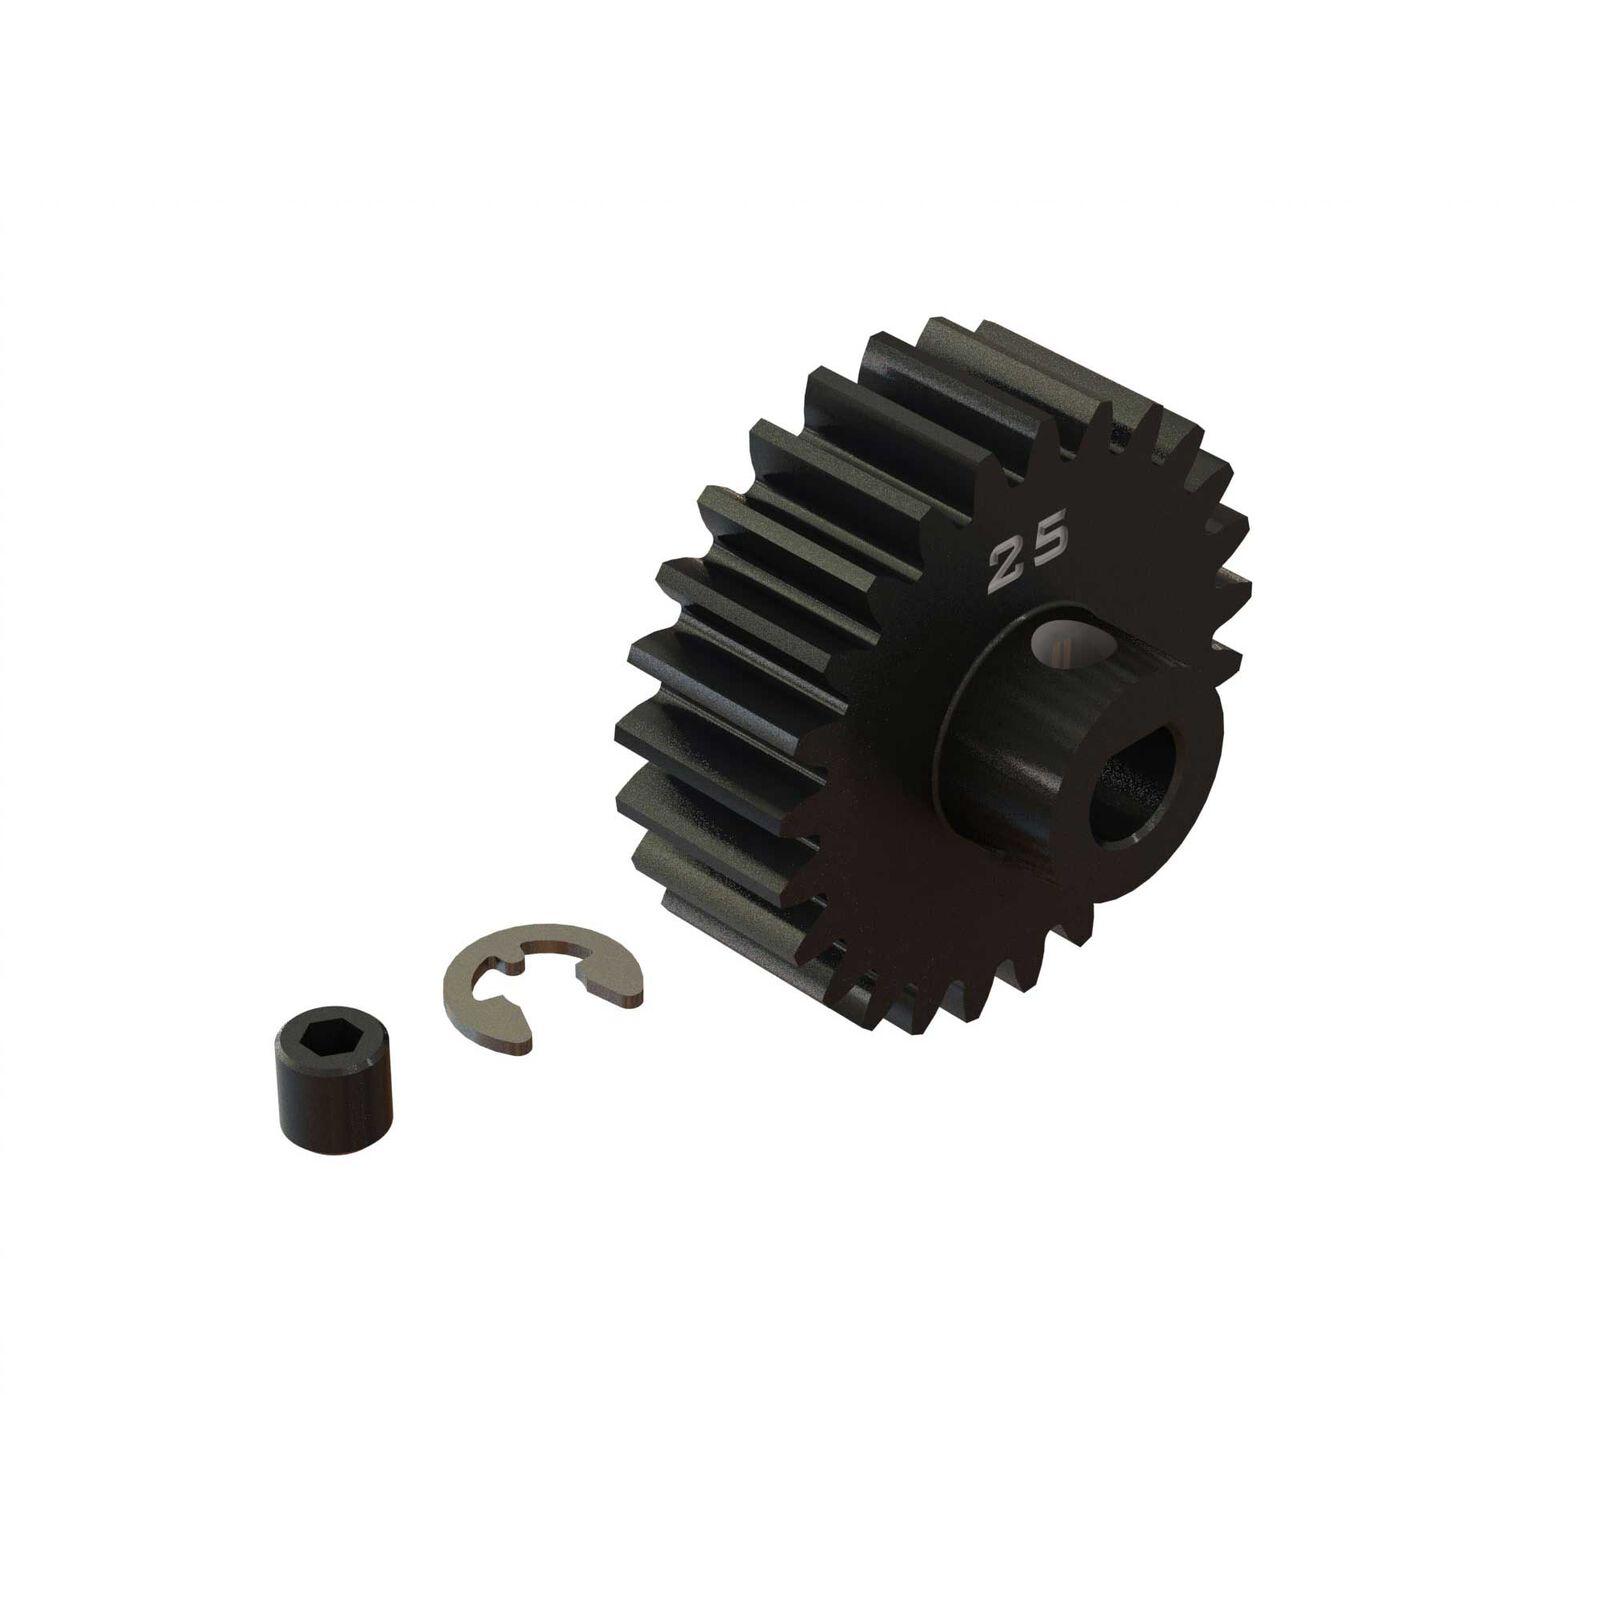 Pinion Gear, 25T HD Mod1 Safe-D5